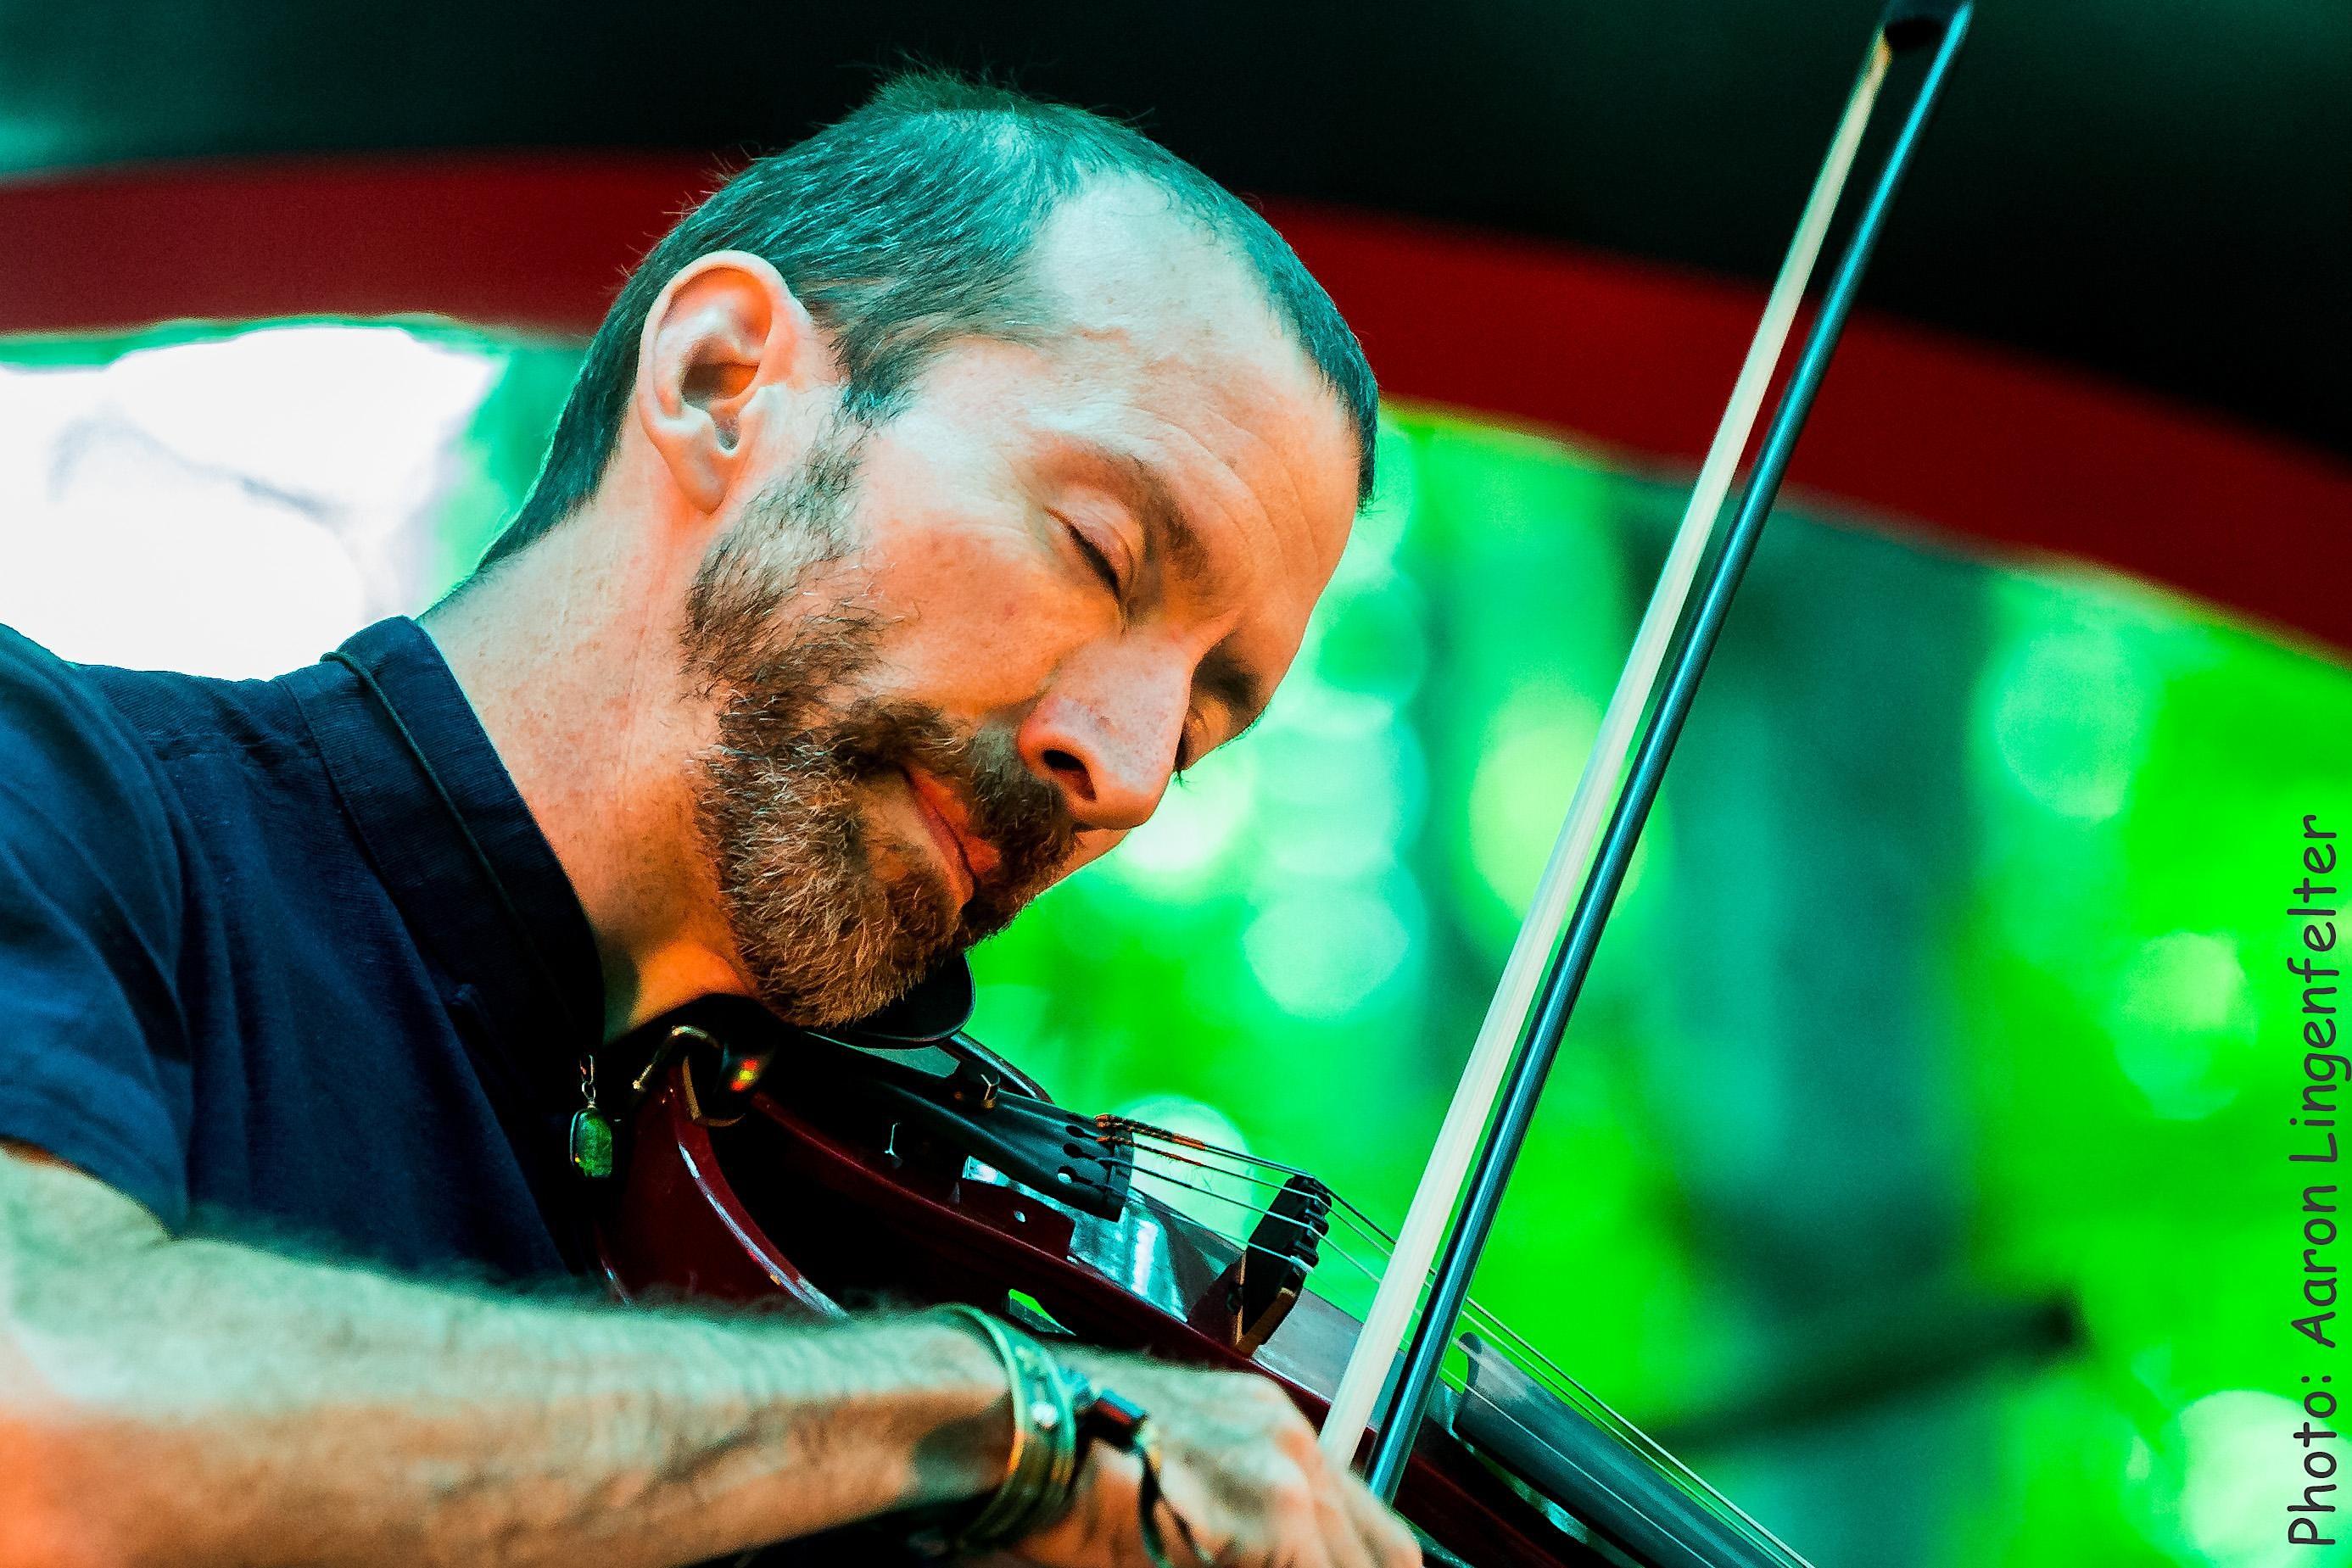 Dixon's Violin wsg Libby DeCamp